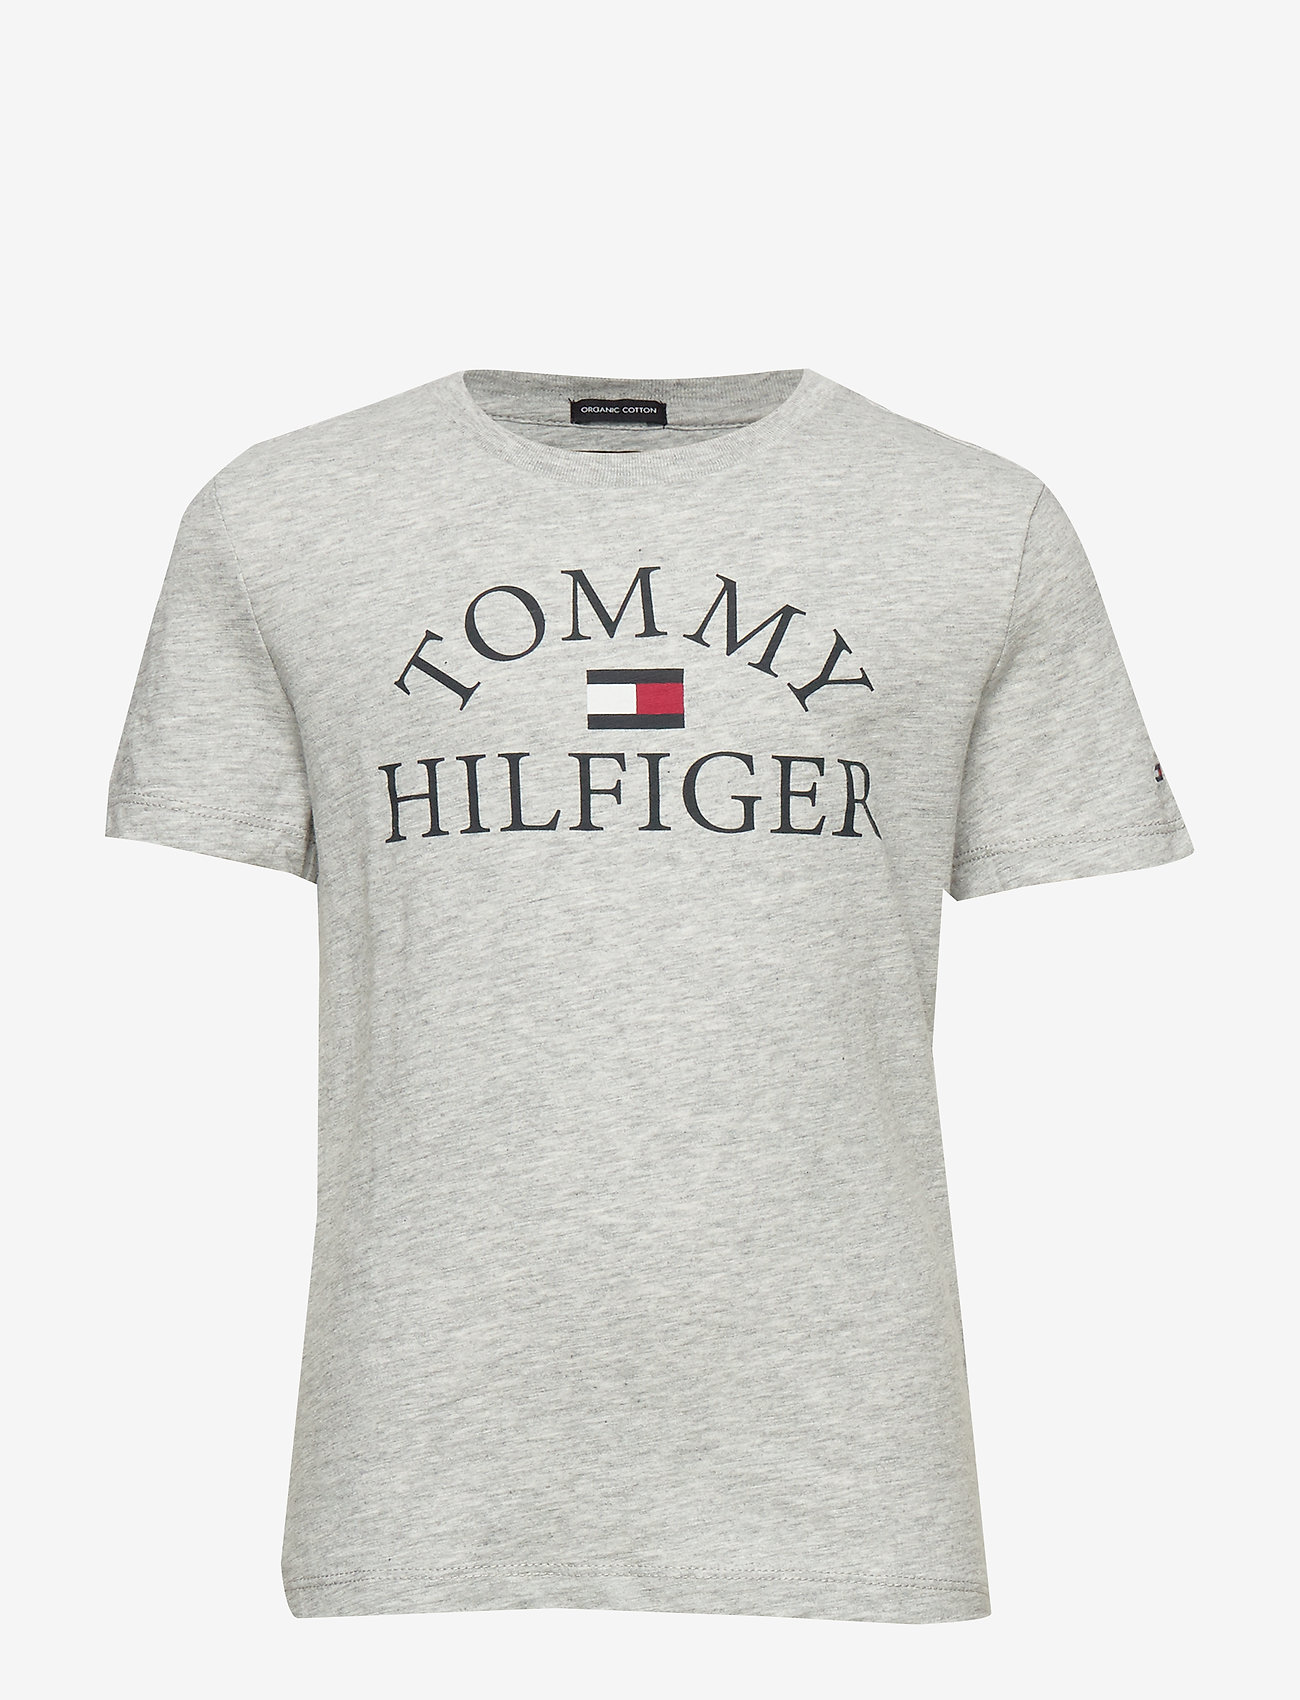 Tommy Hilfiger - ESSENTIAL LOGO TEE S - short-sleeved - light grey heather bc04 vol32 - 0